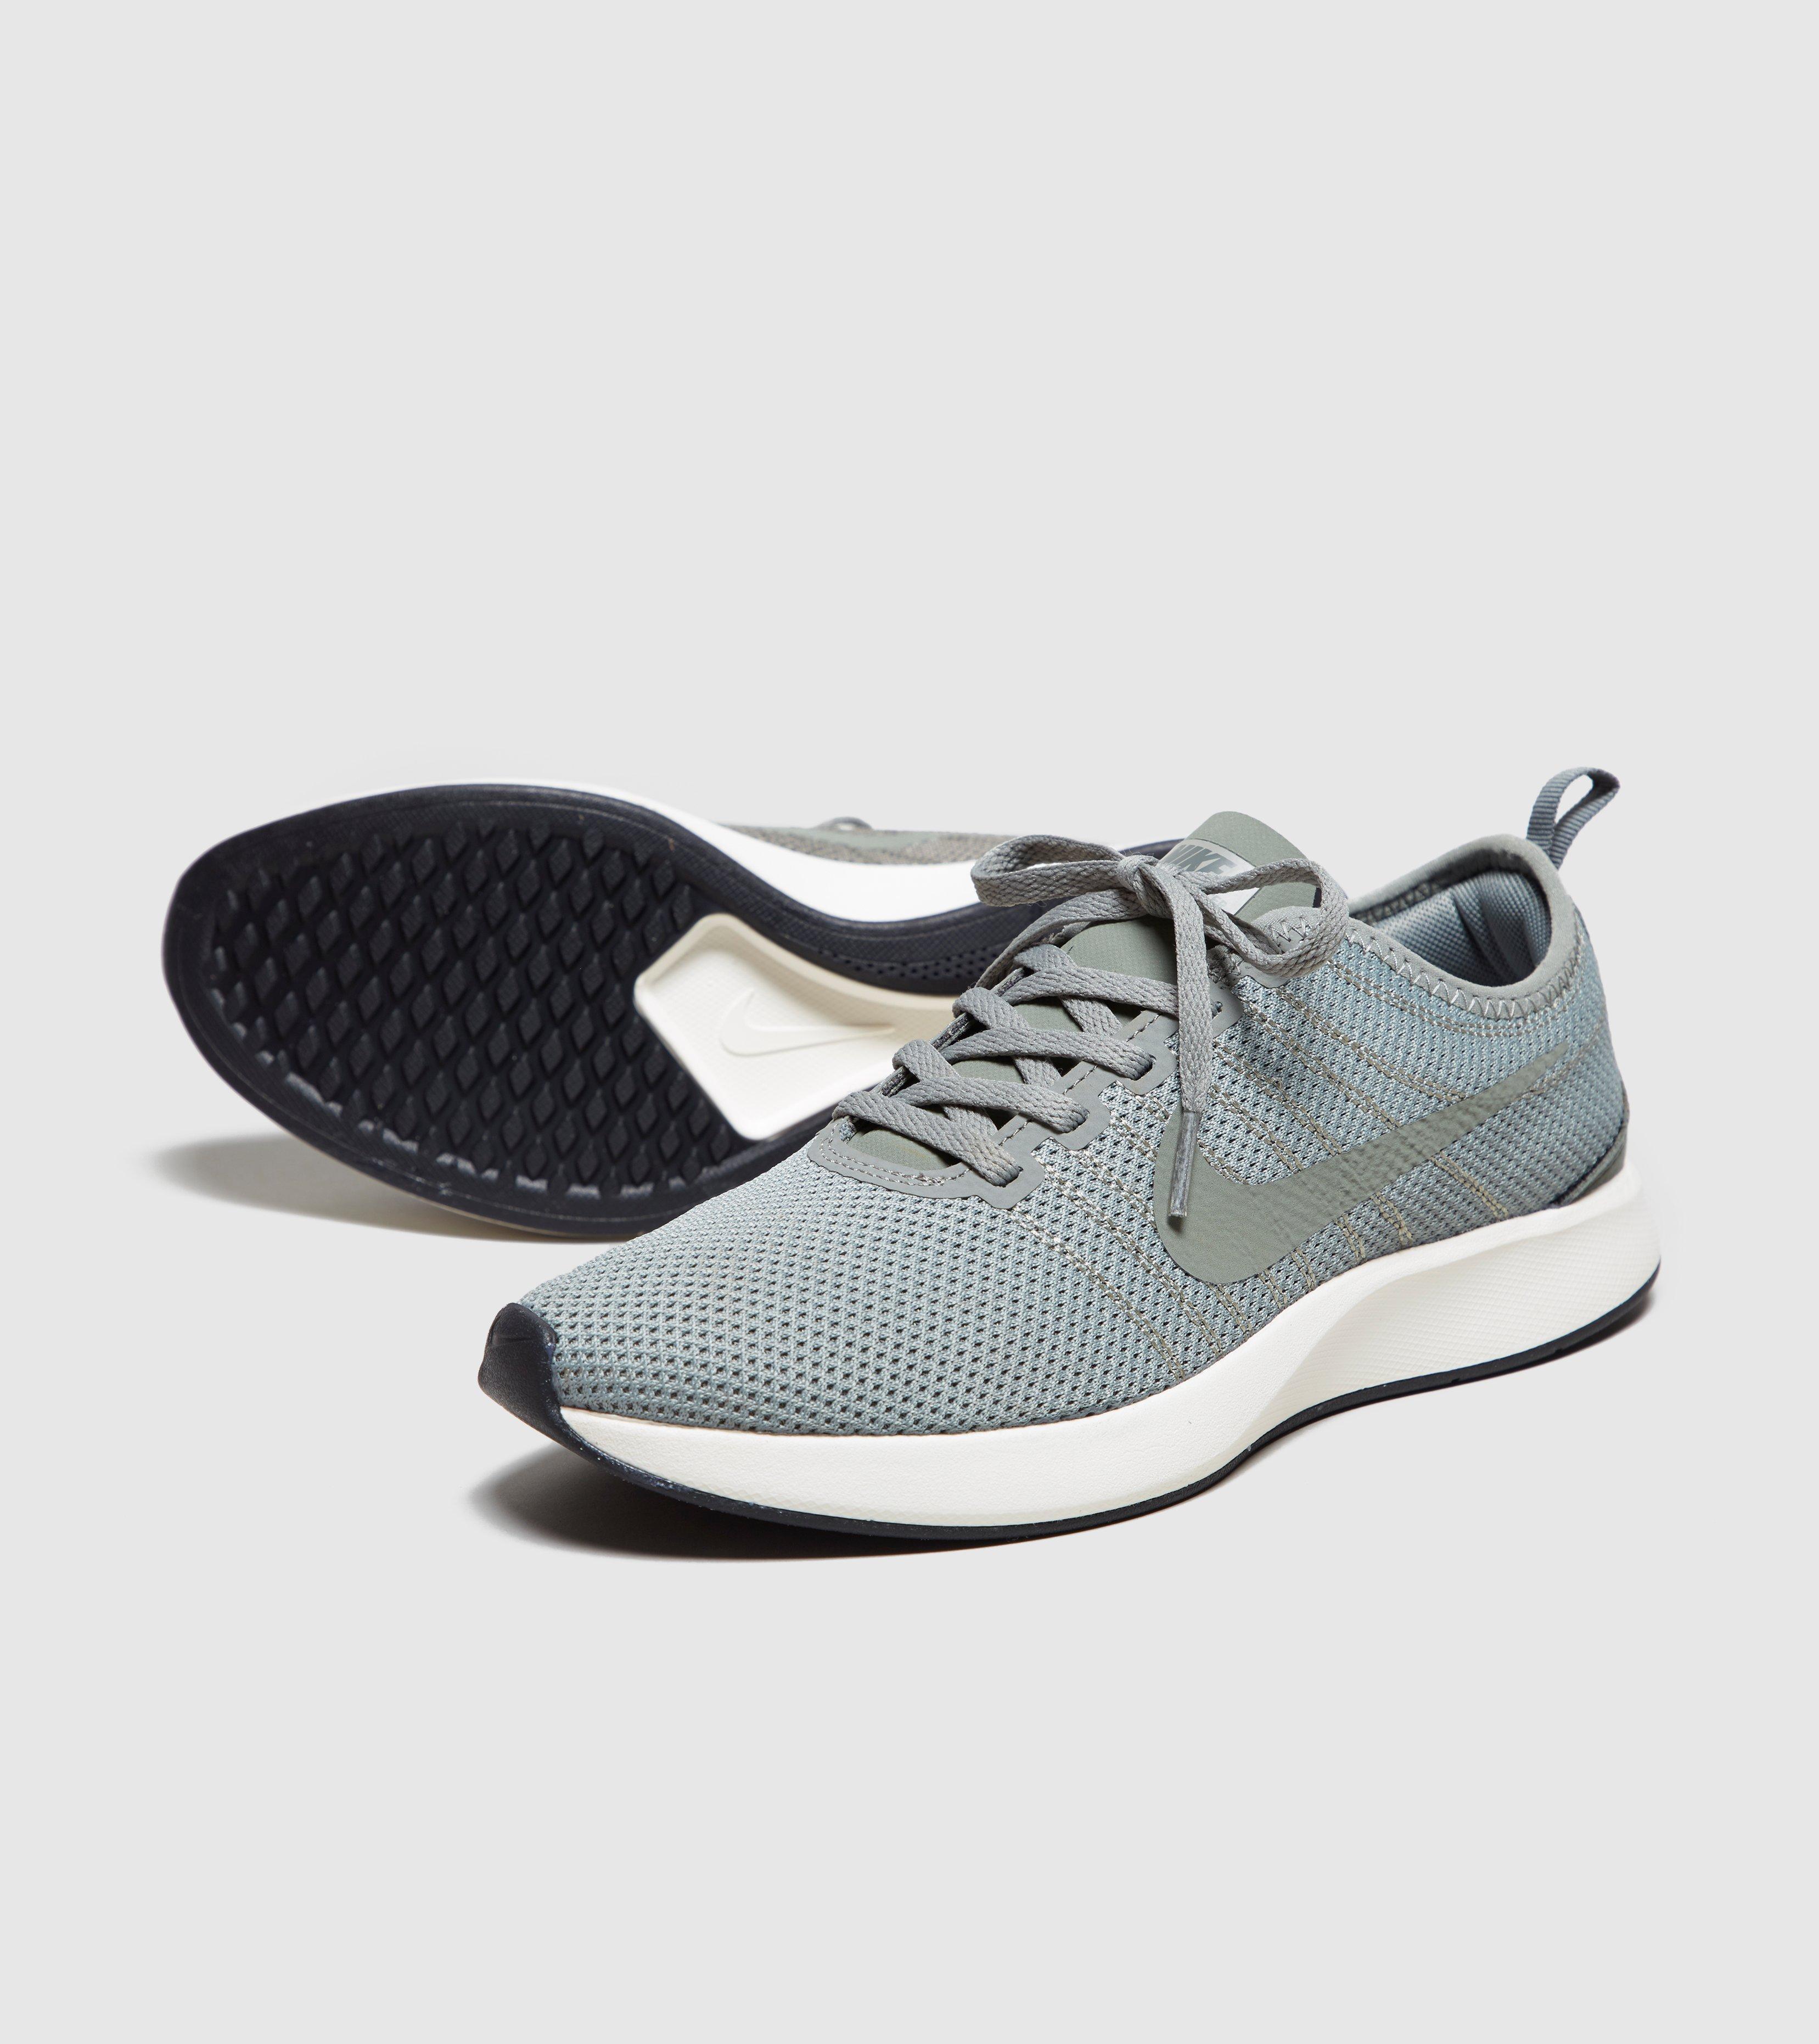 quality design 4e760 7f6b9 Lyst - Nike Dualtone Racer Women s